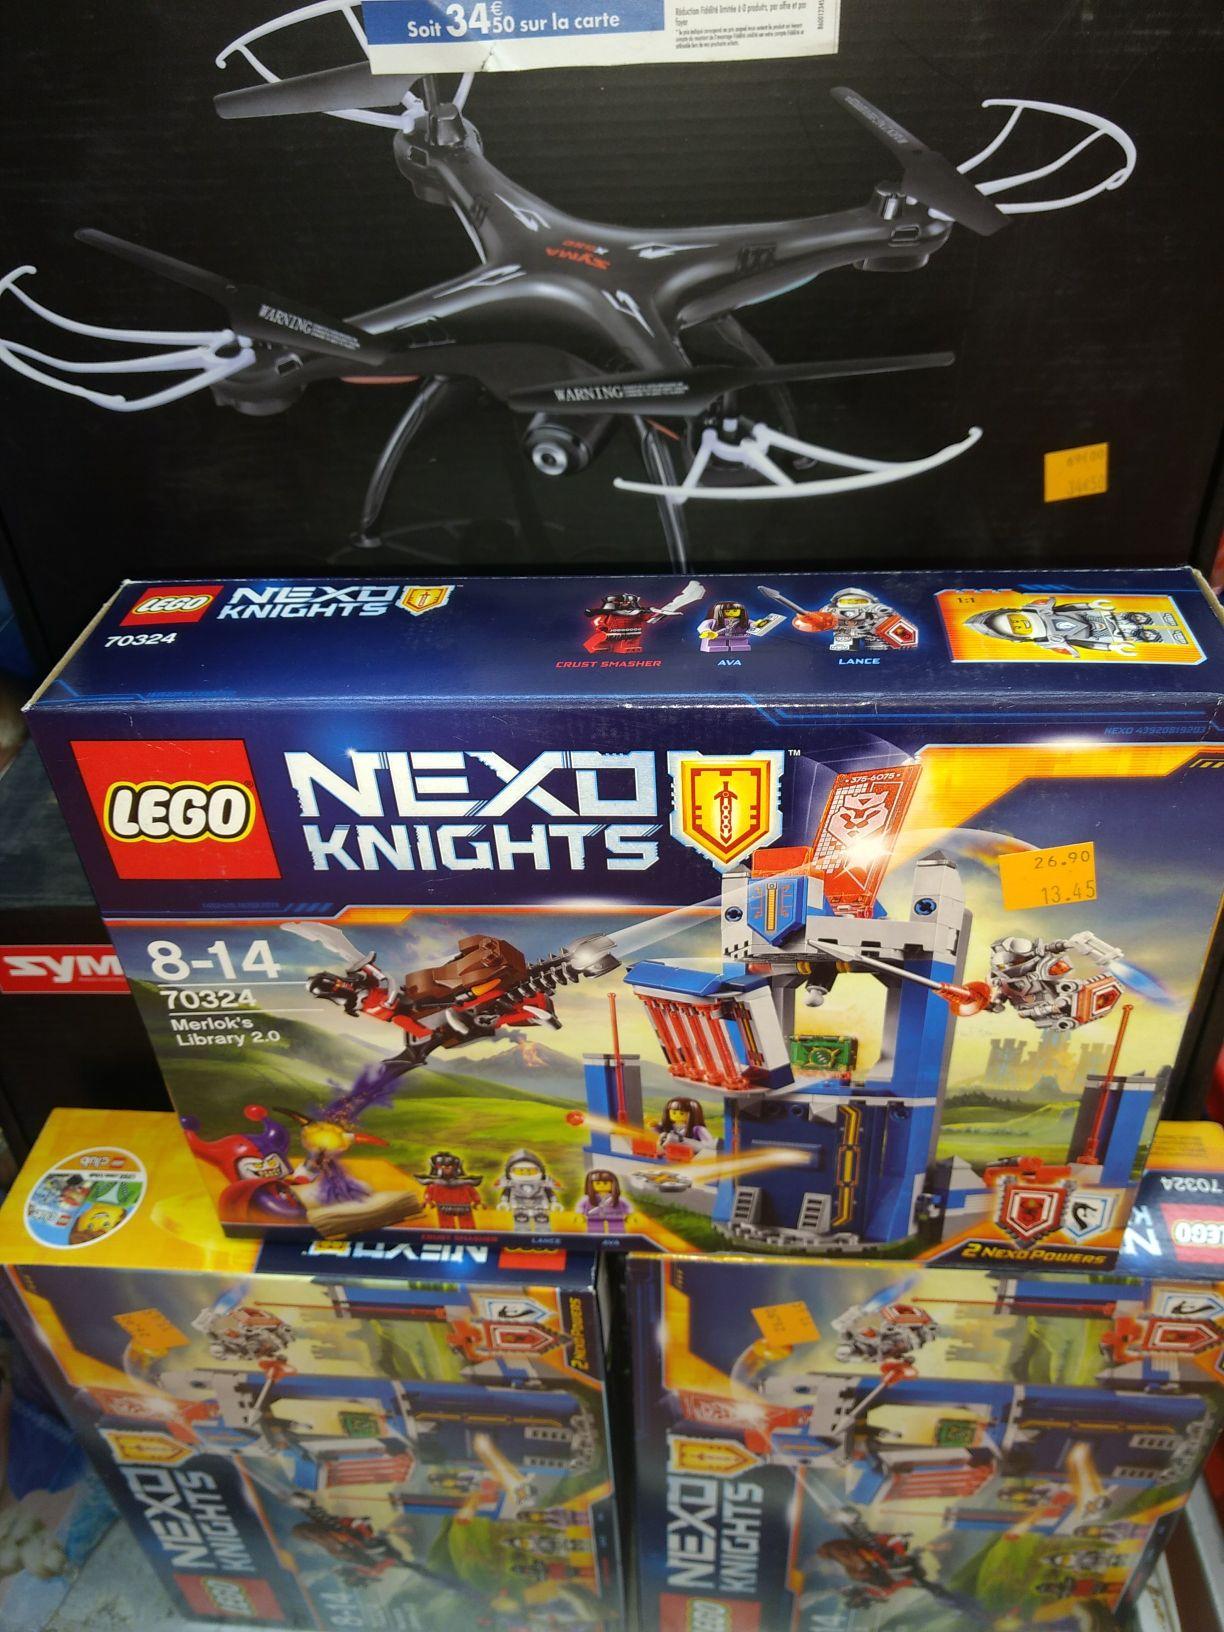 Jeu de Construction Lego Nexo Knights 70324 - La bibliothèque 2.0 de Merlok - L'Isle-d'Abeau (38)